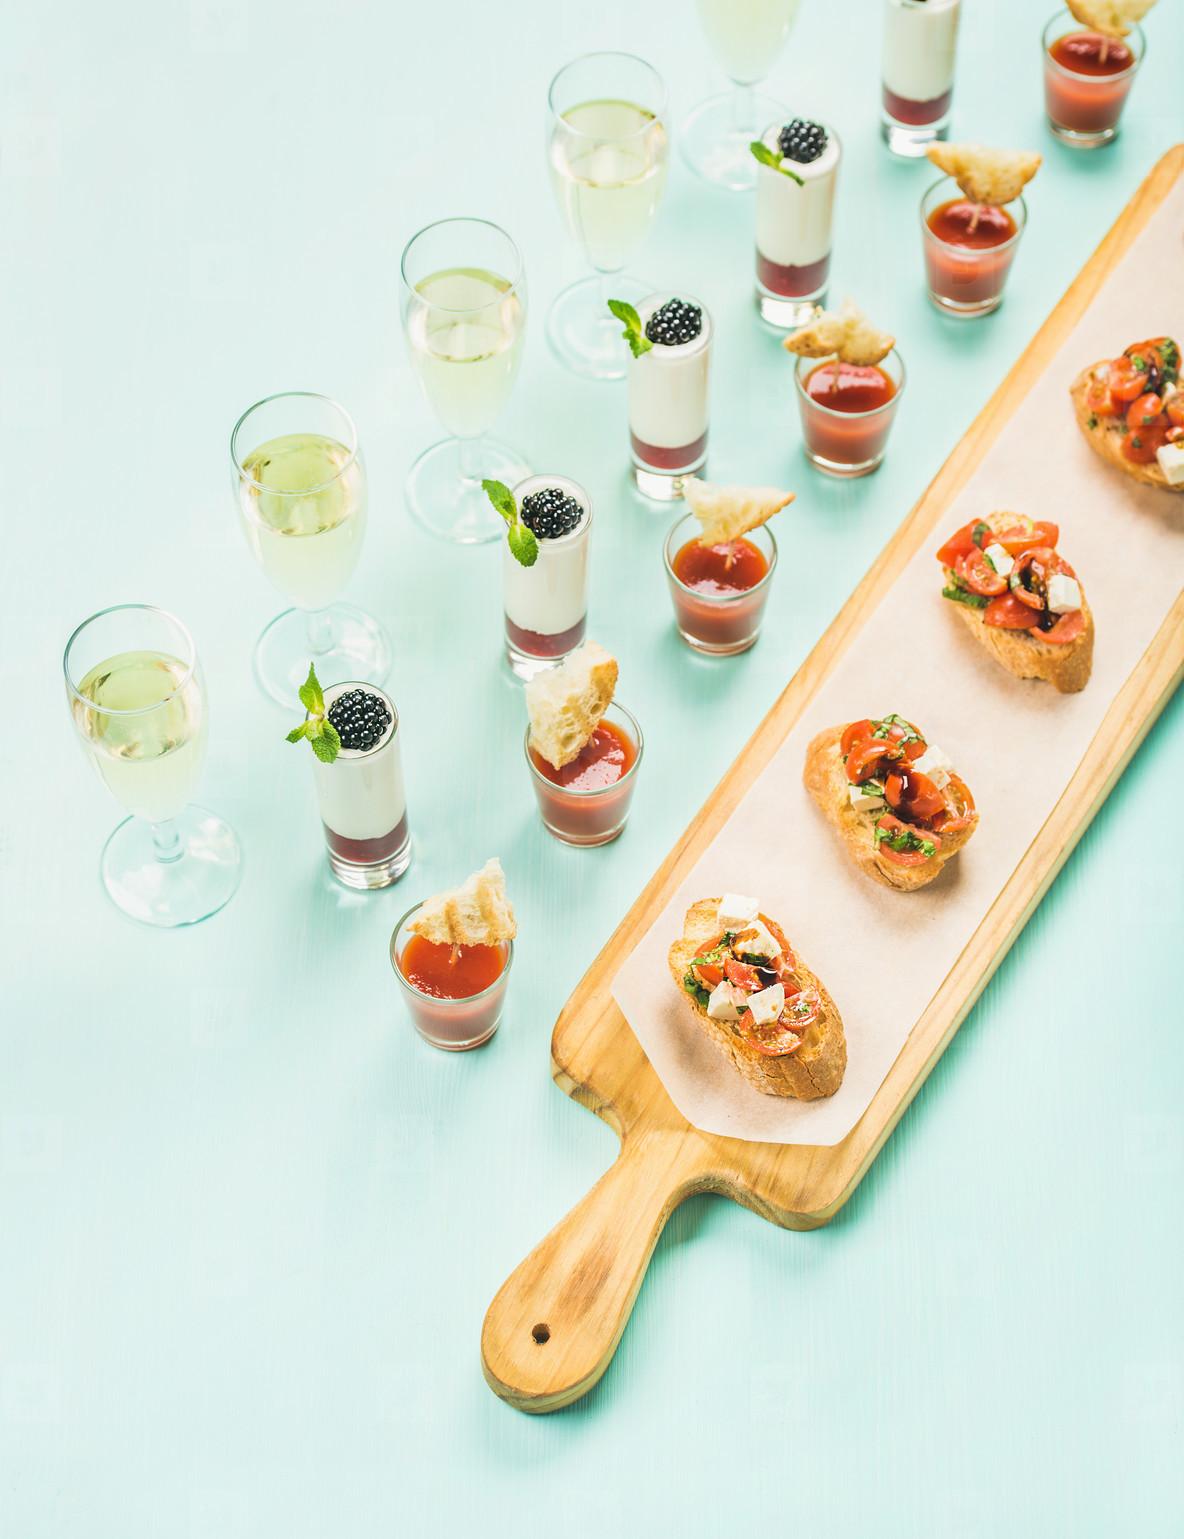 Snacks  brushettas  gazpacho shots  desserts  champagne over pastel blue background